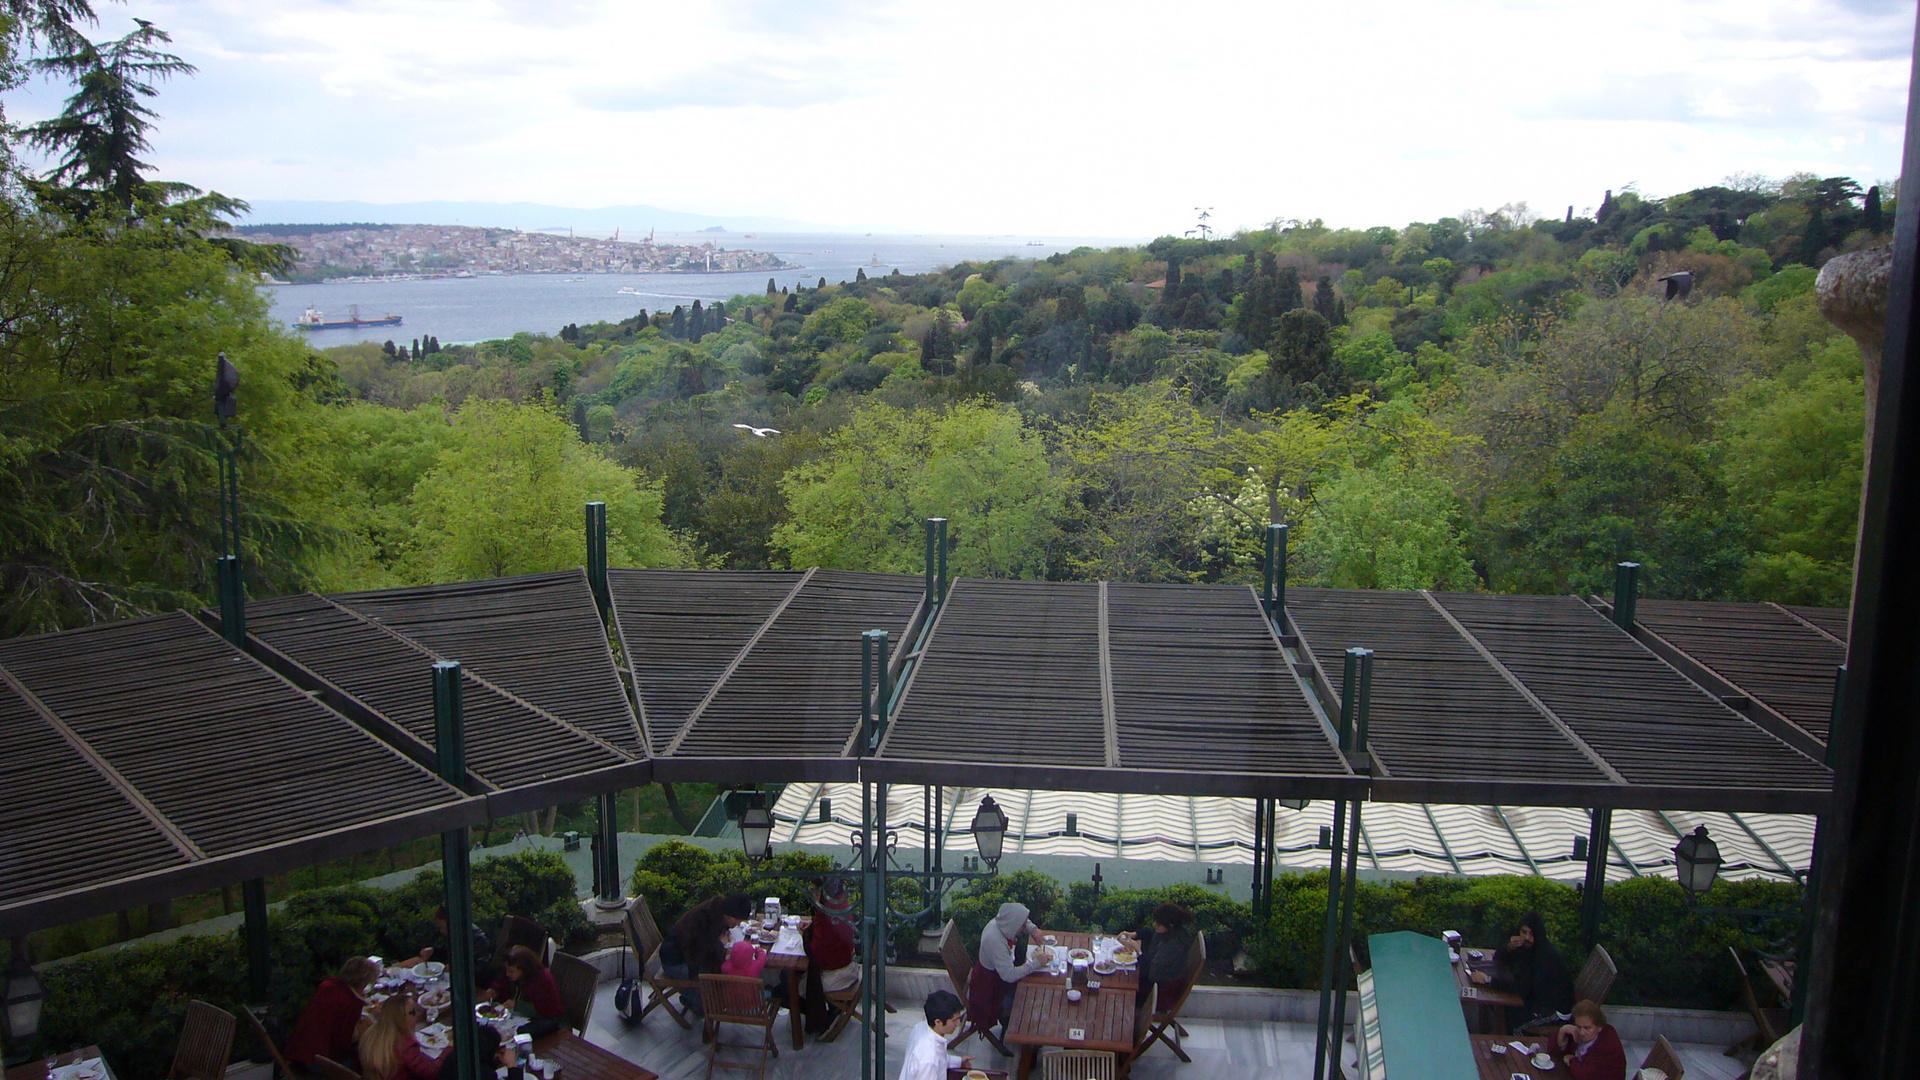 VERA YILDIZ PARK ISTANBUL